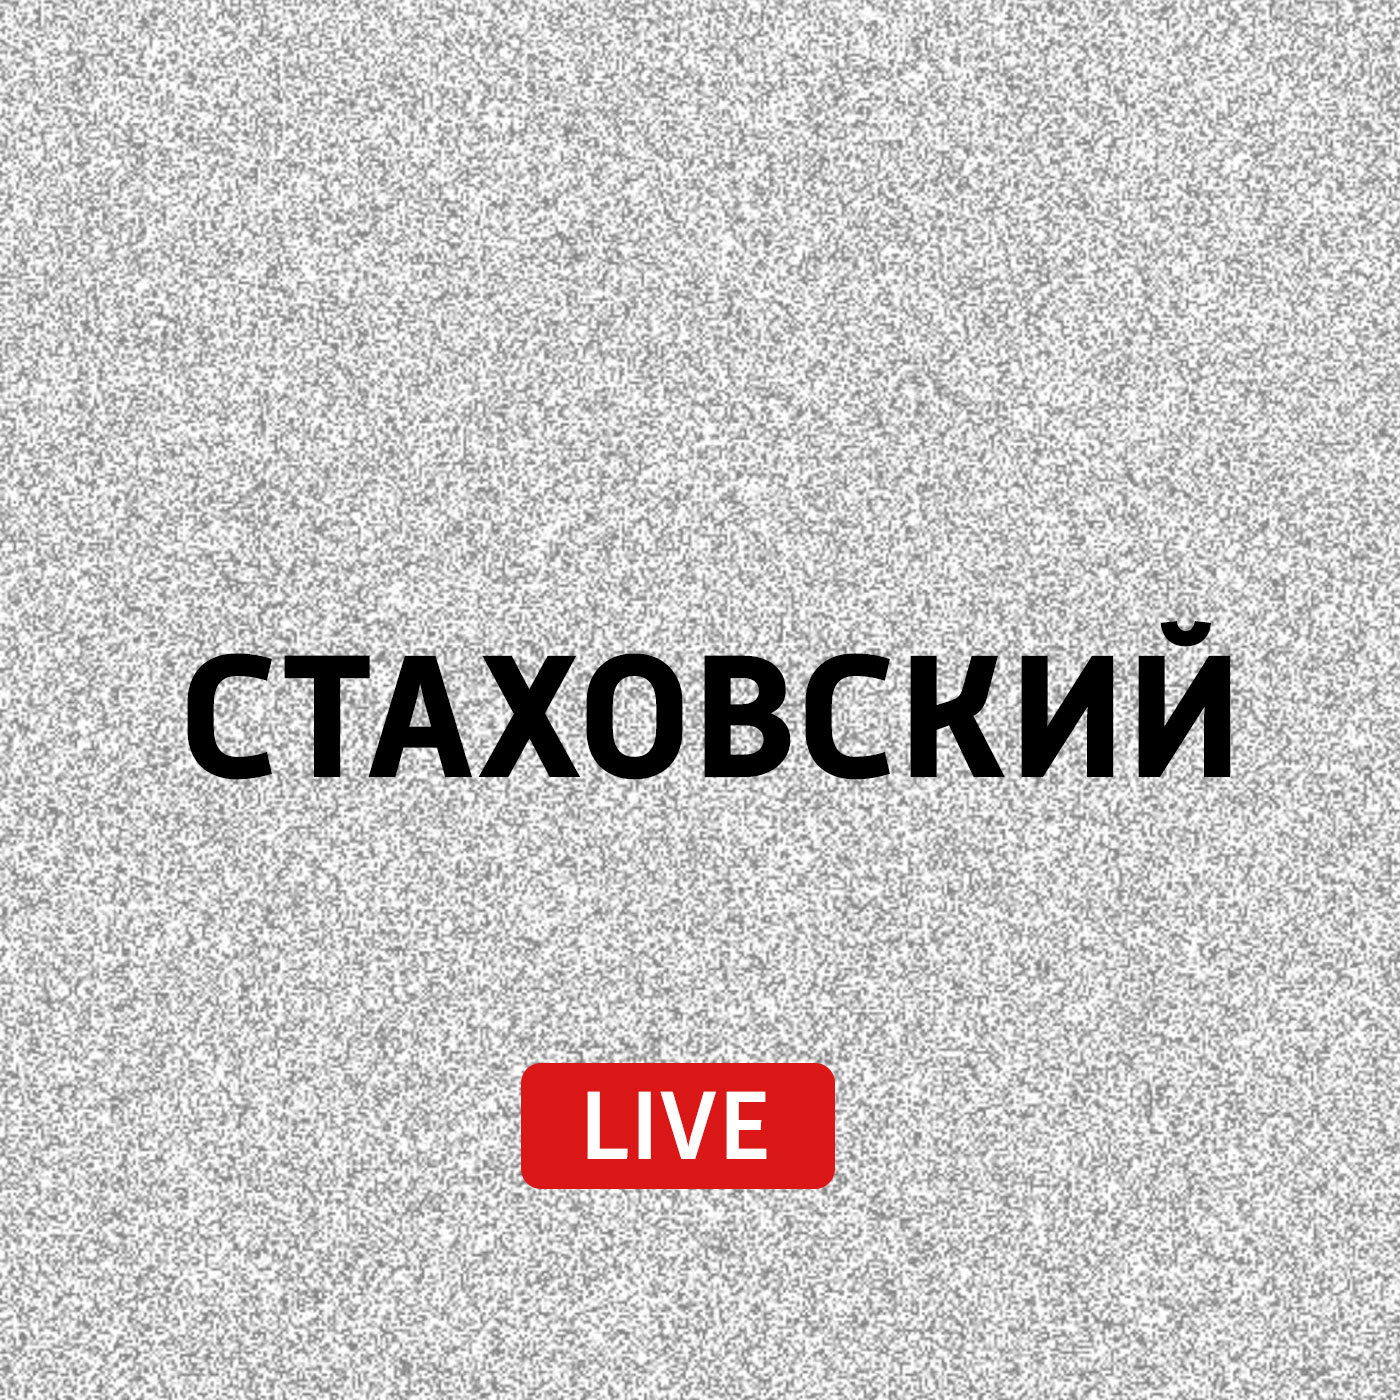 Евгений Стаховский Репост евгений стаховский о поэзии